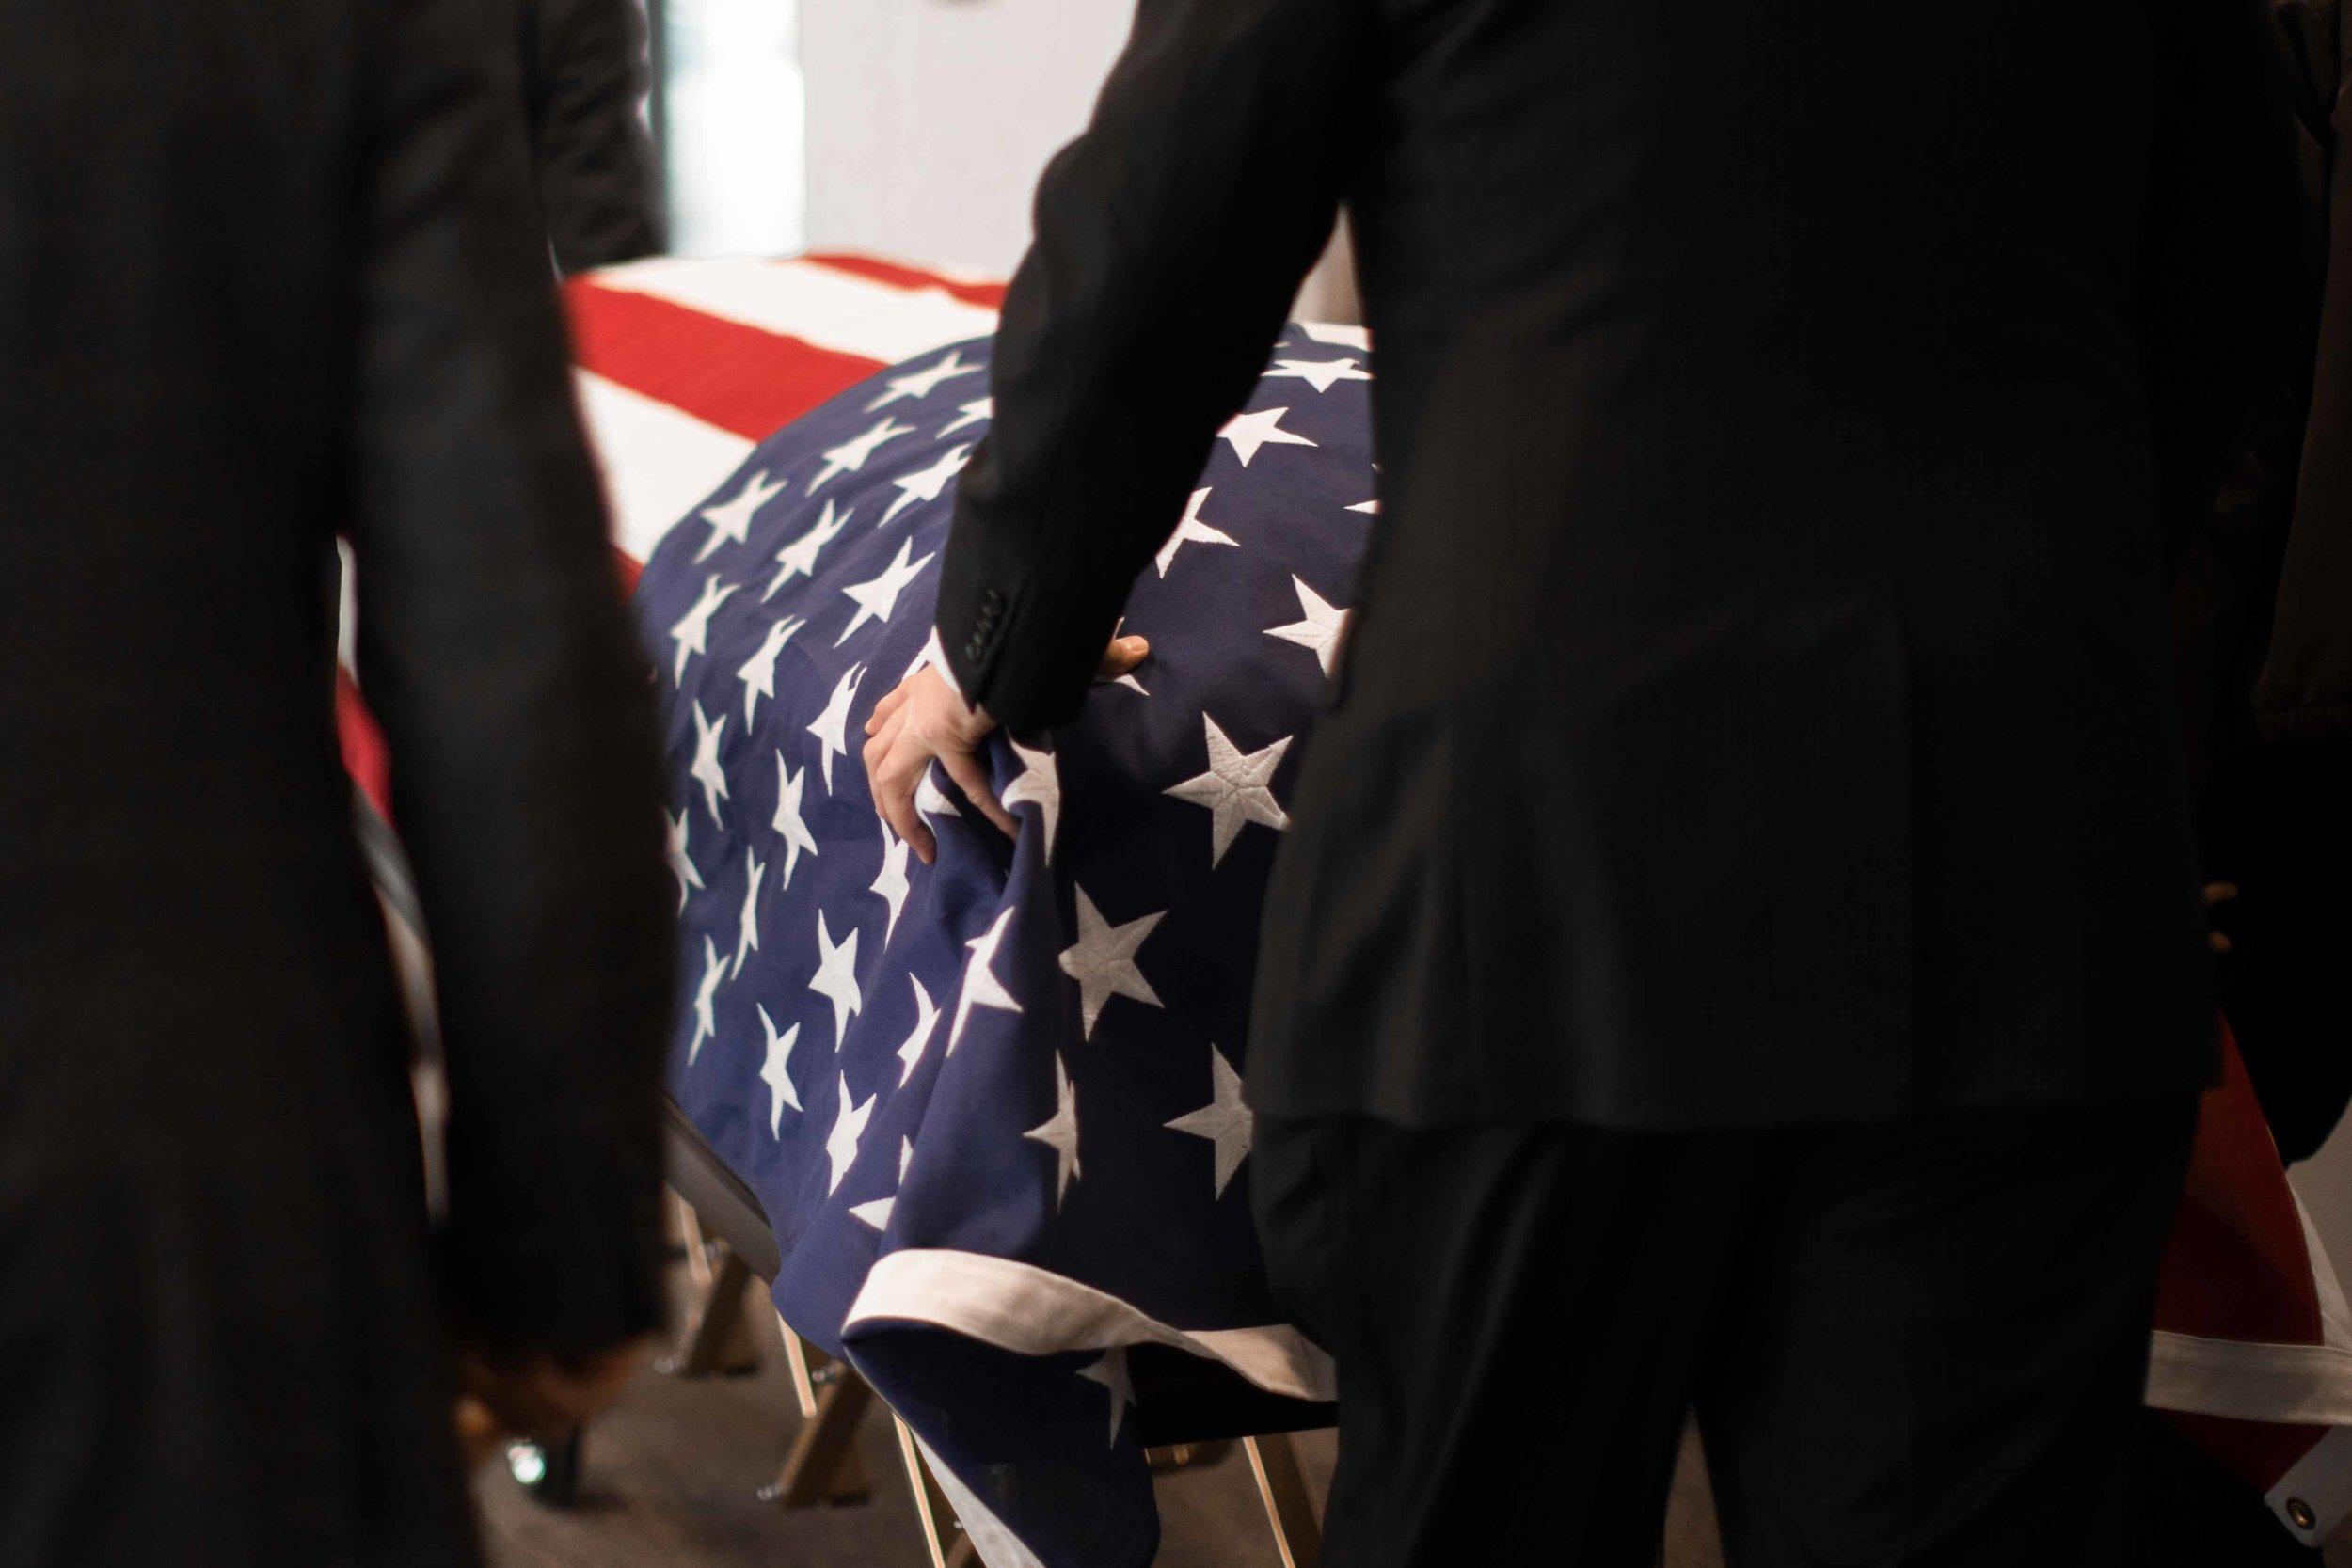 Darrald_Funeral_17-2.jpg